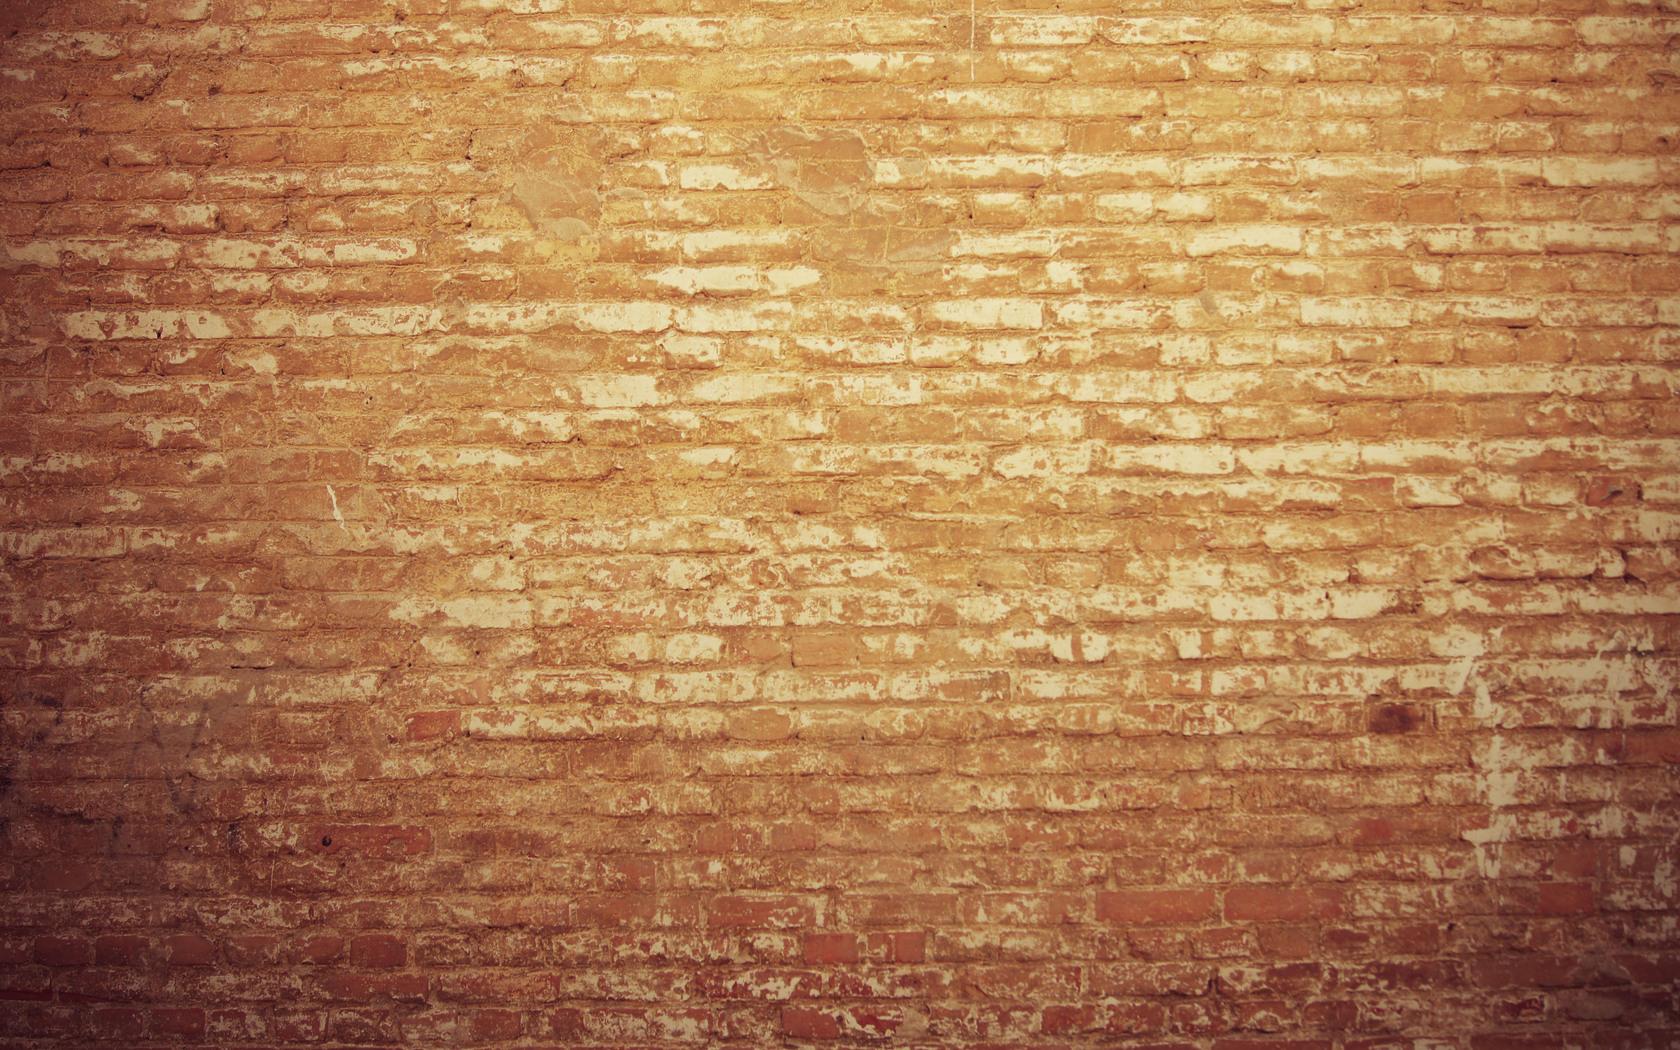 Brick Texture 40 Desktop Wallpaper